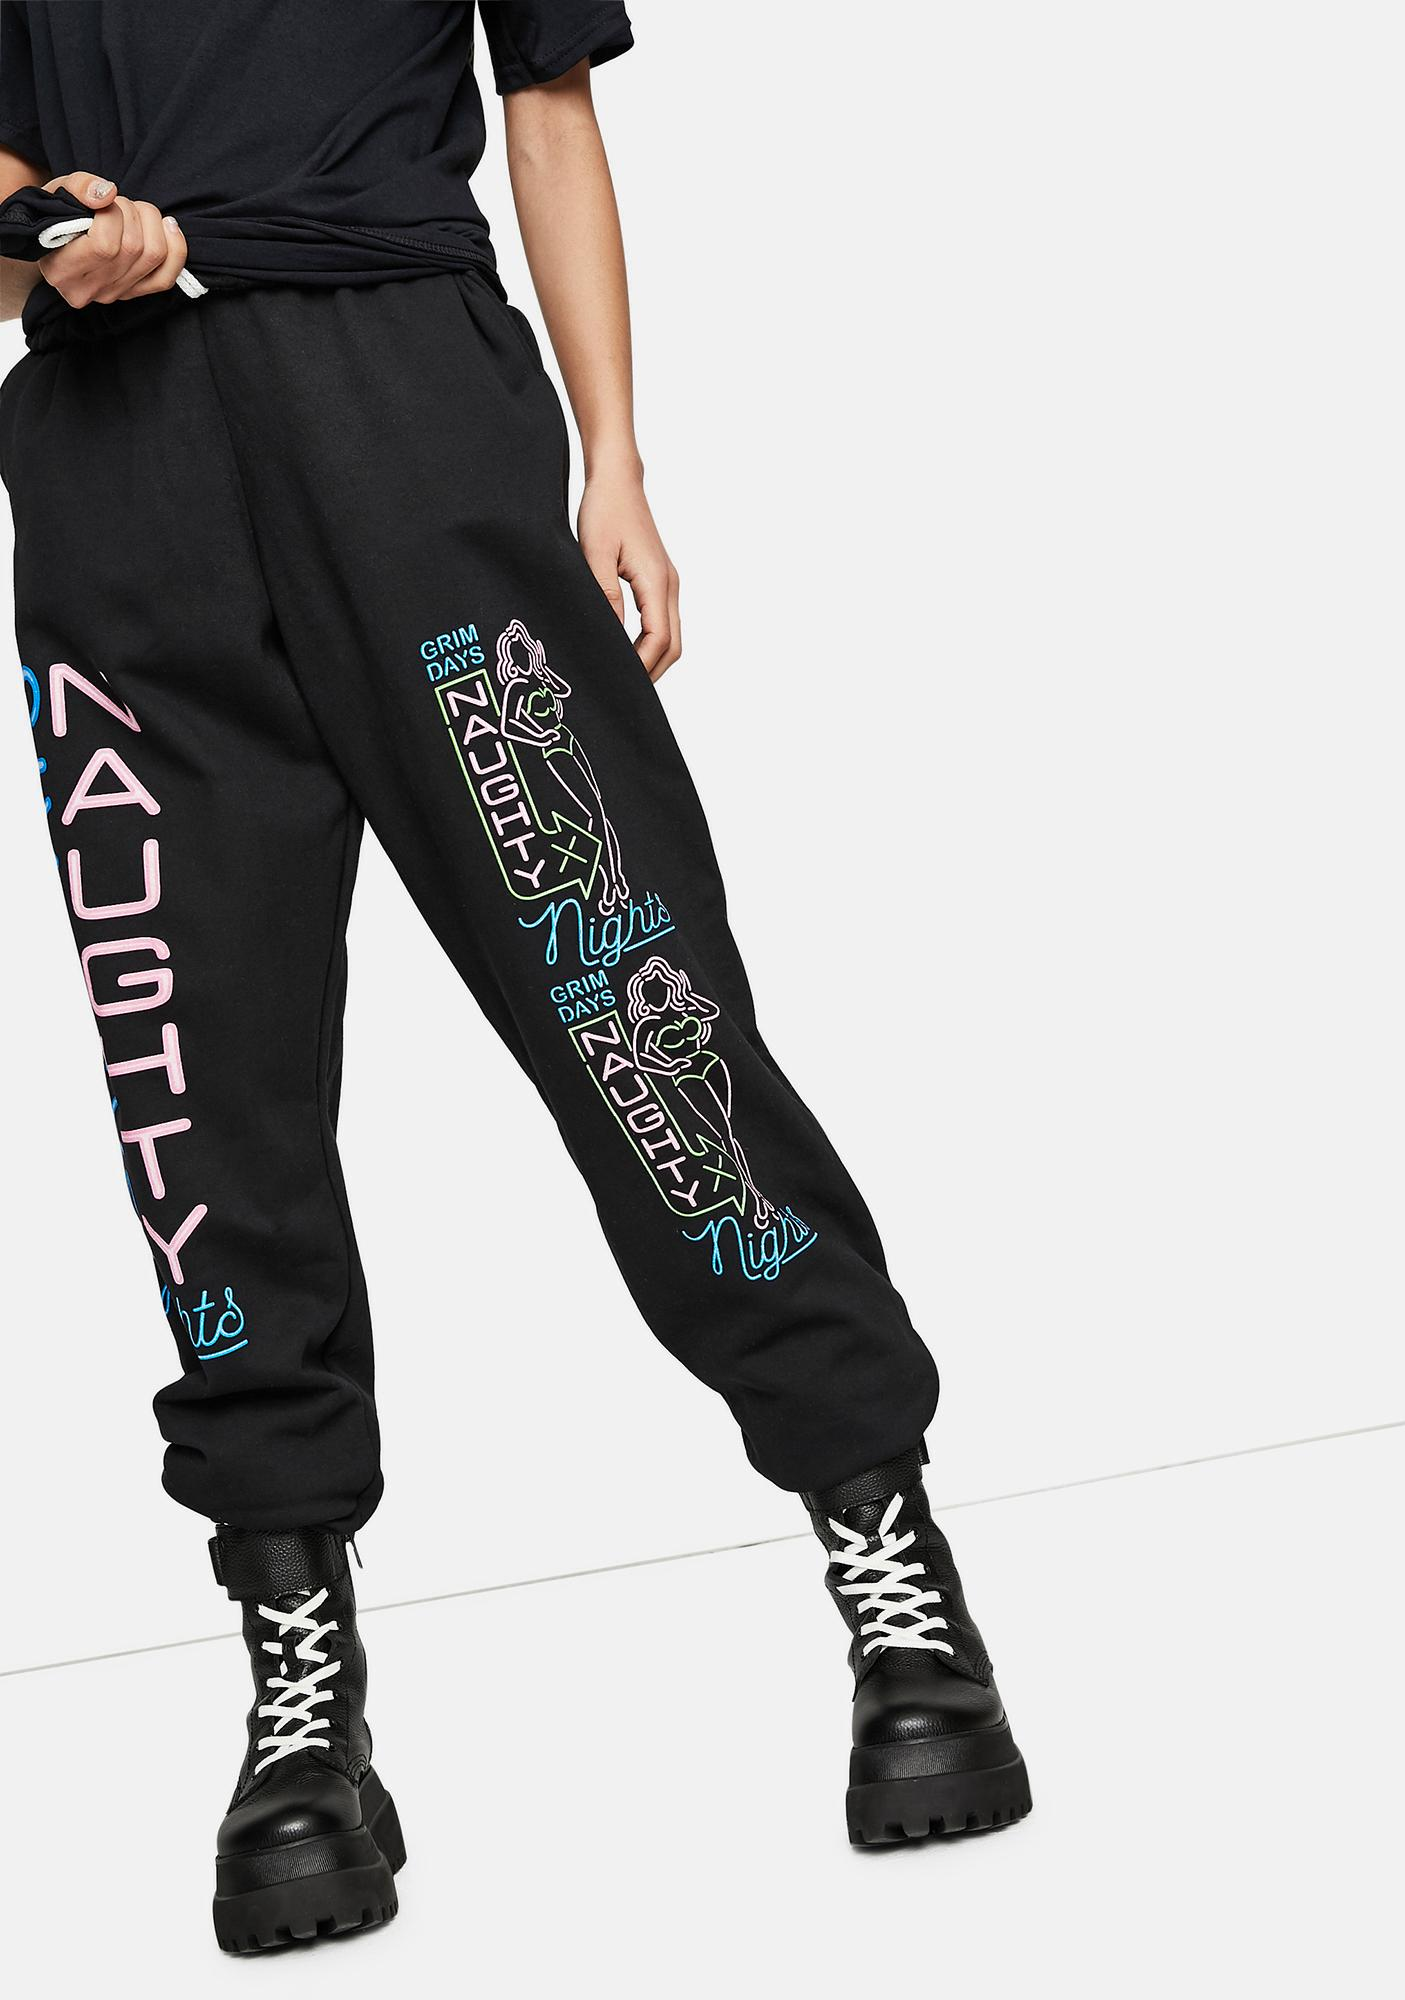 GRIM DAYS Naughty Graphic Sweatpants